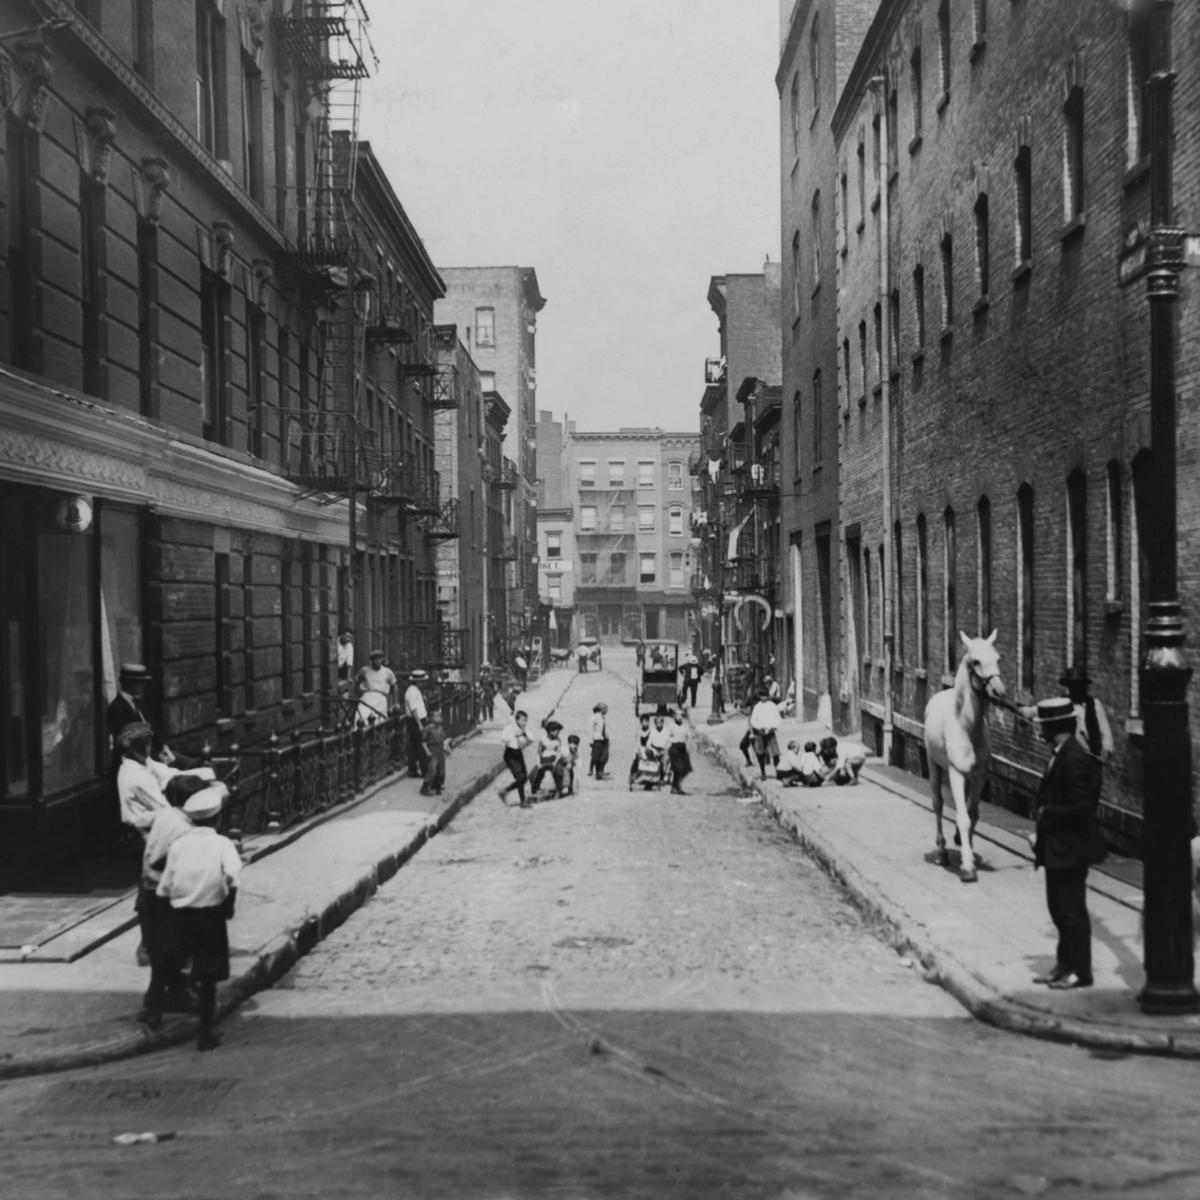 Greenwich Village, New York City, 1923.